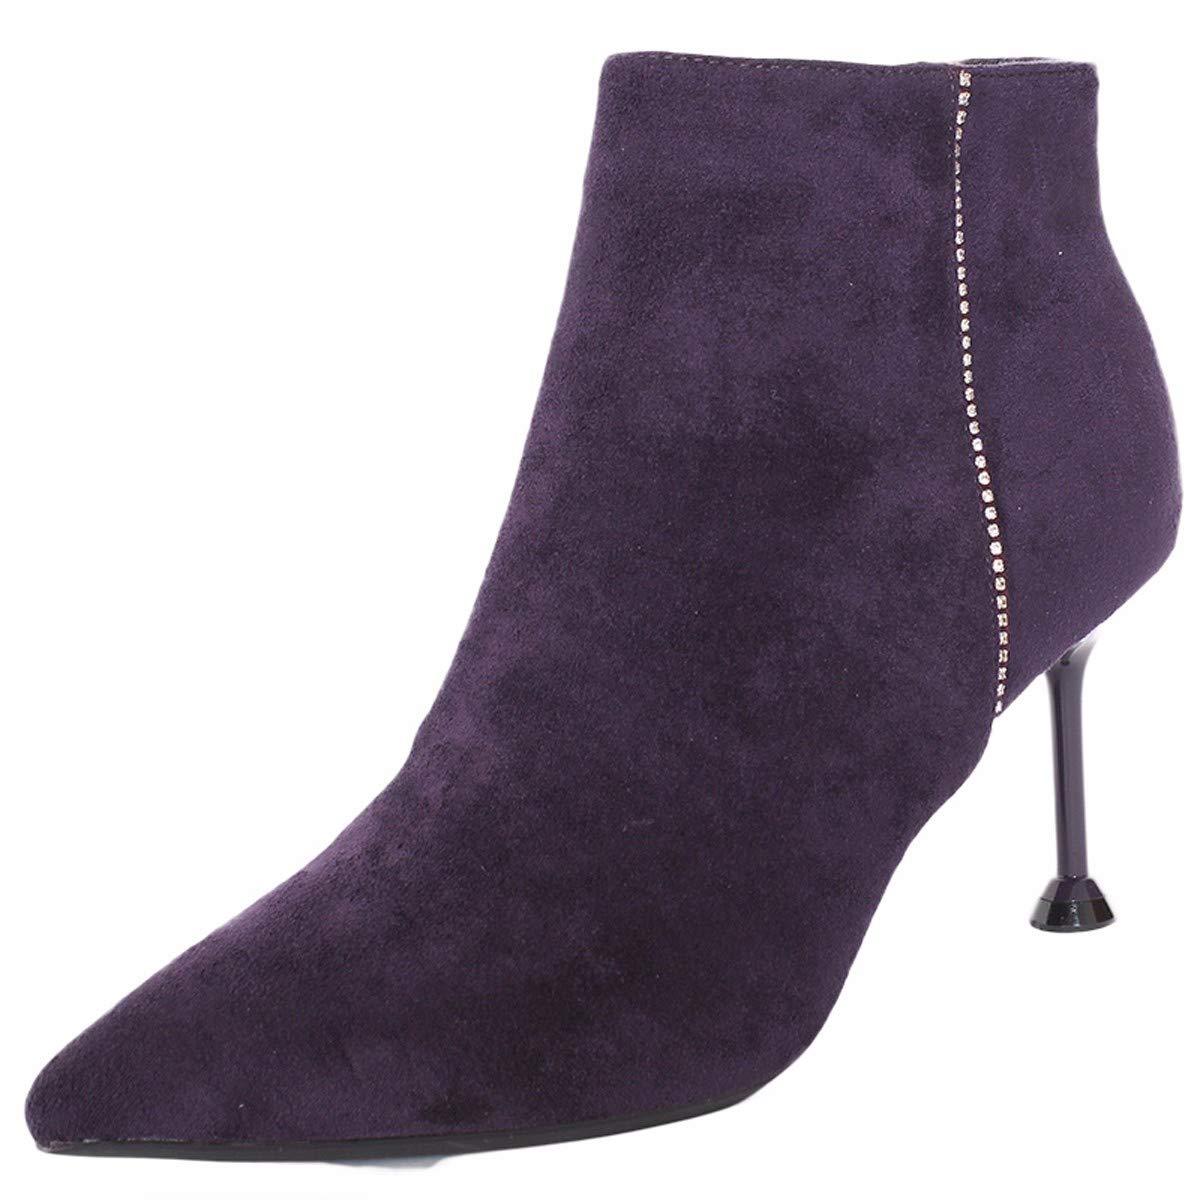 LBTSQ-Mode/Damenschuhe/Spitz Dünn Und Ferse Mit Hohen 8 cm Kurze Stiefel Reißverschlüsse Samt Mode Wild Schuhe Martin Schuhe.